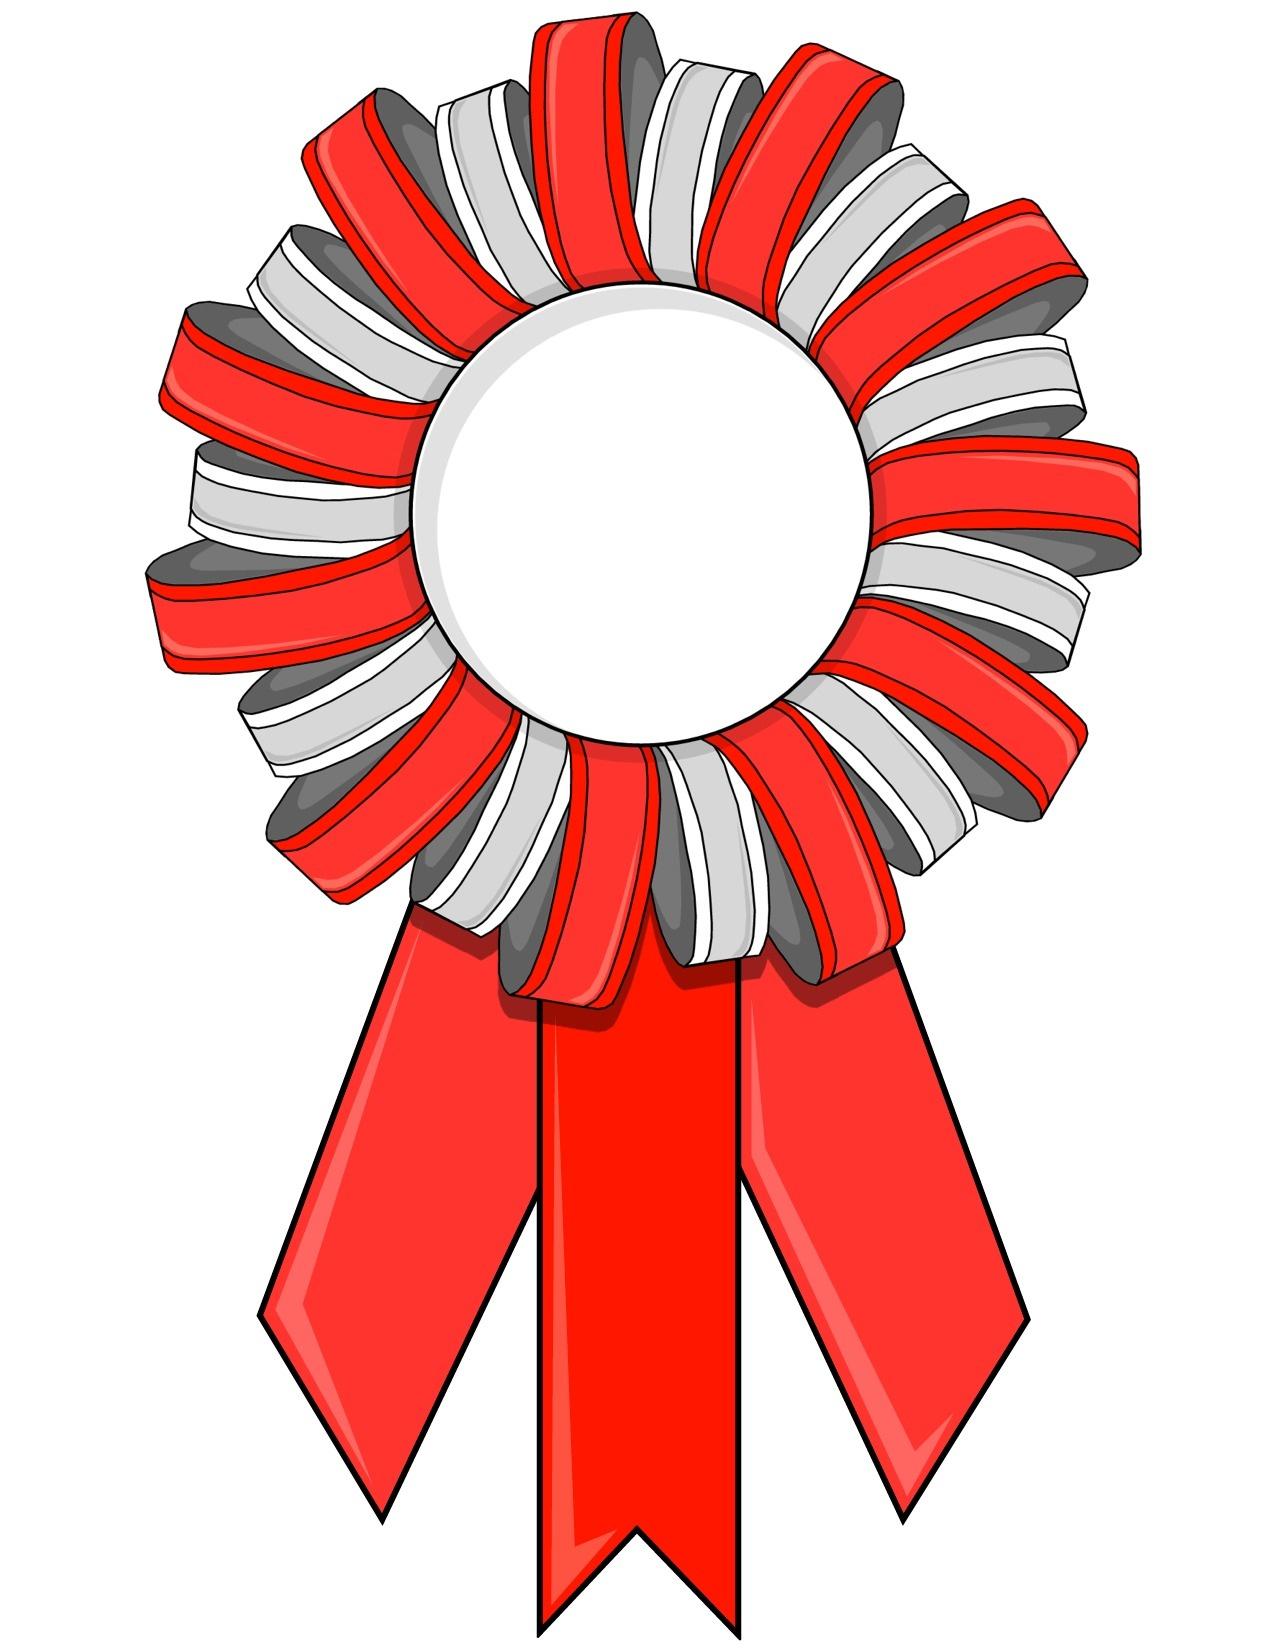 Printable Award Ribbons | Free Download Best Printable Award Ribbons - Free Printable Ribbons